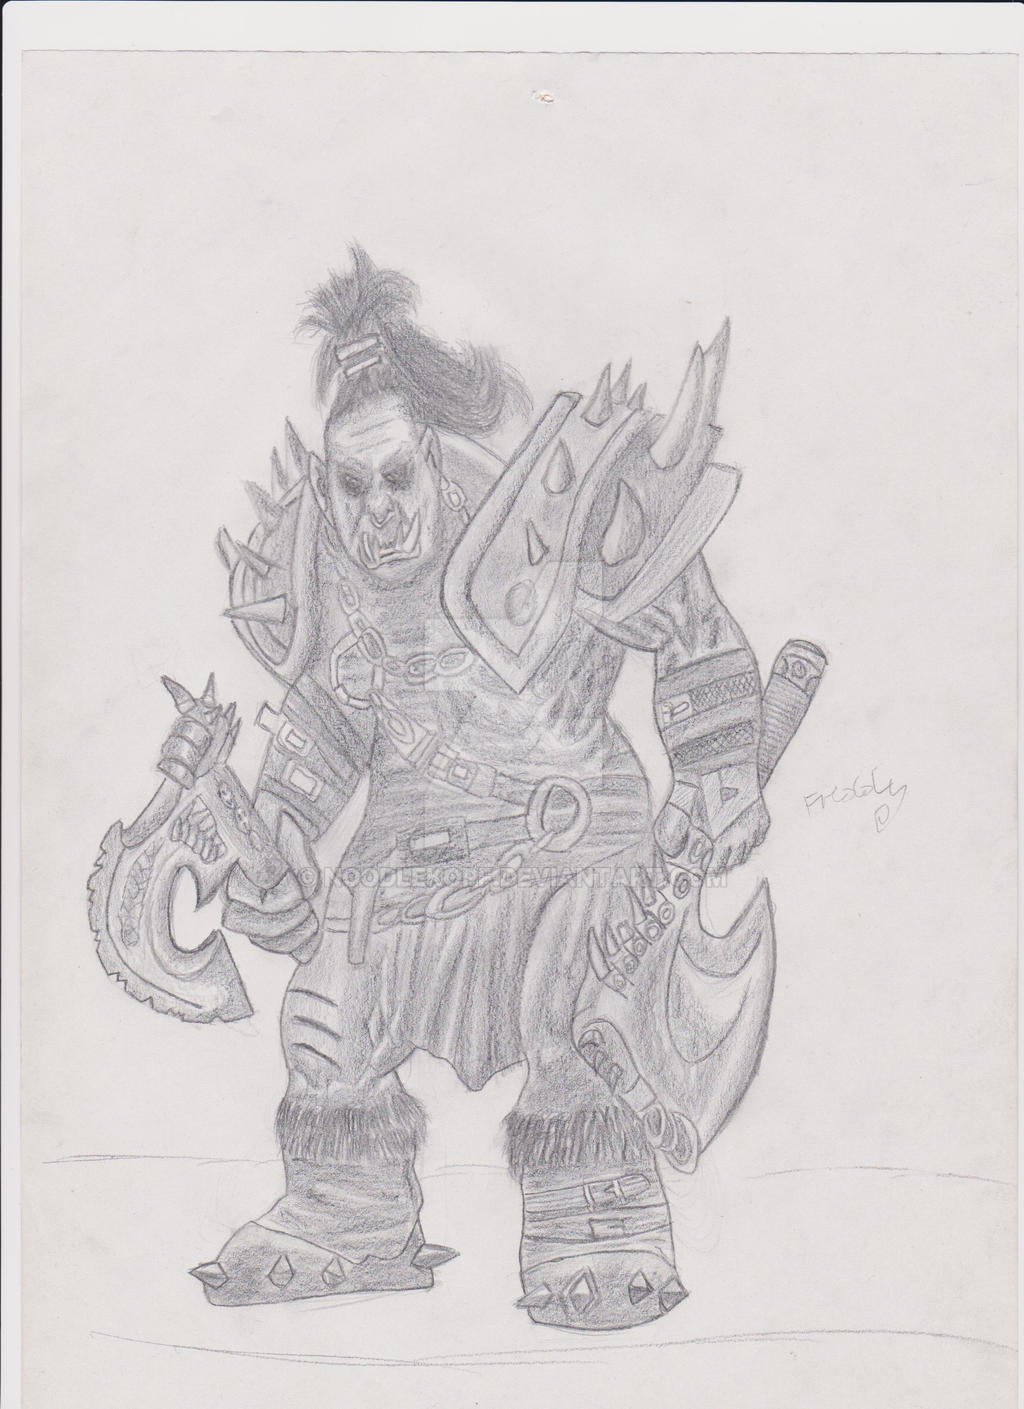 Warcraft Orc Fanart